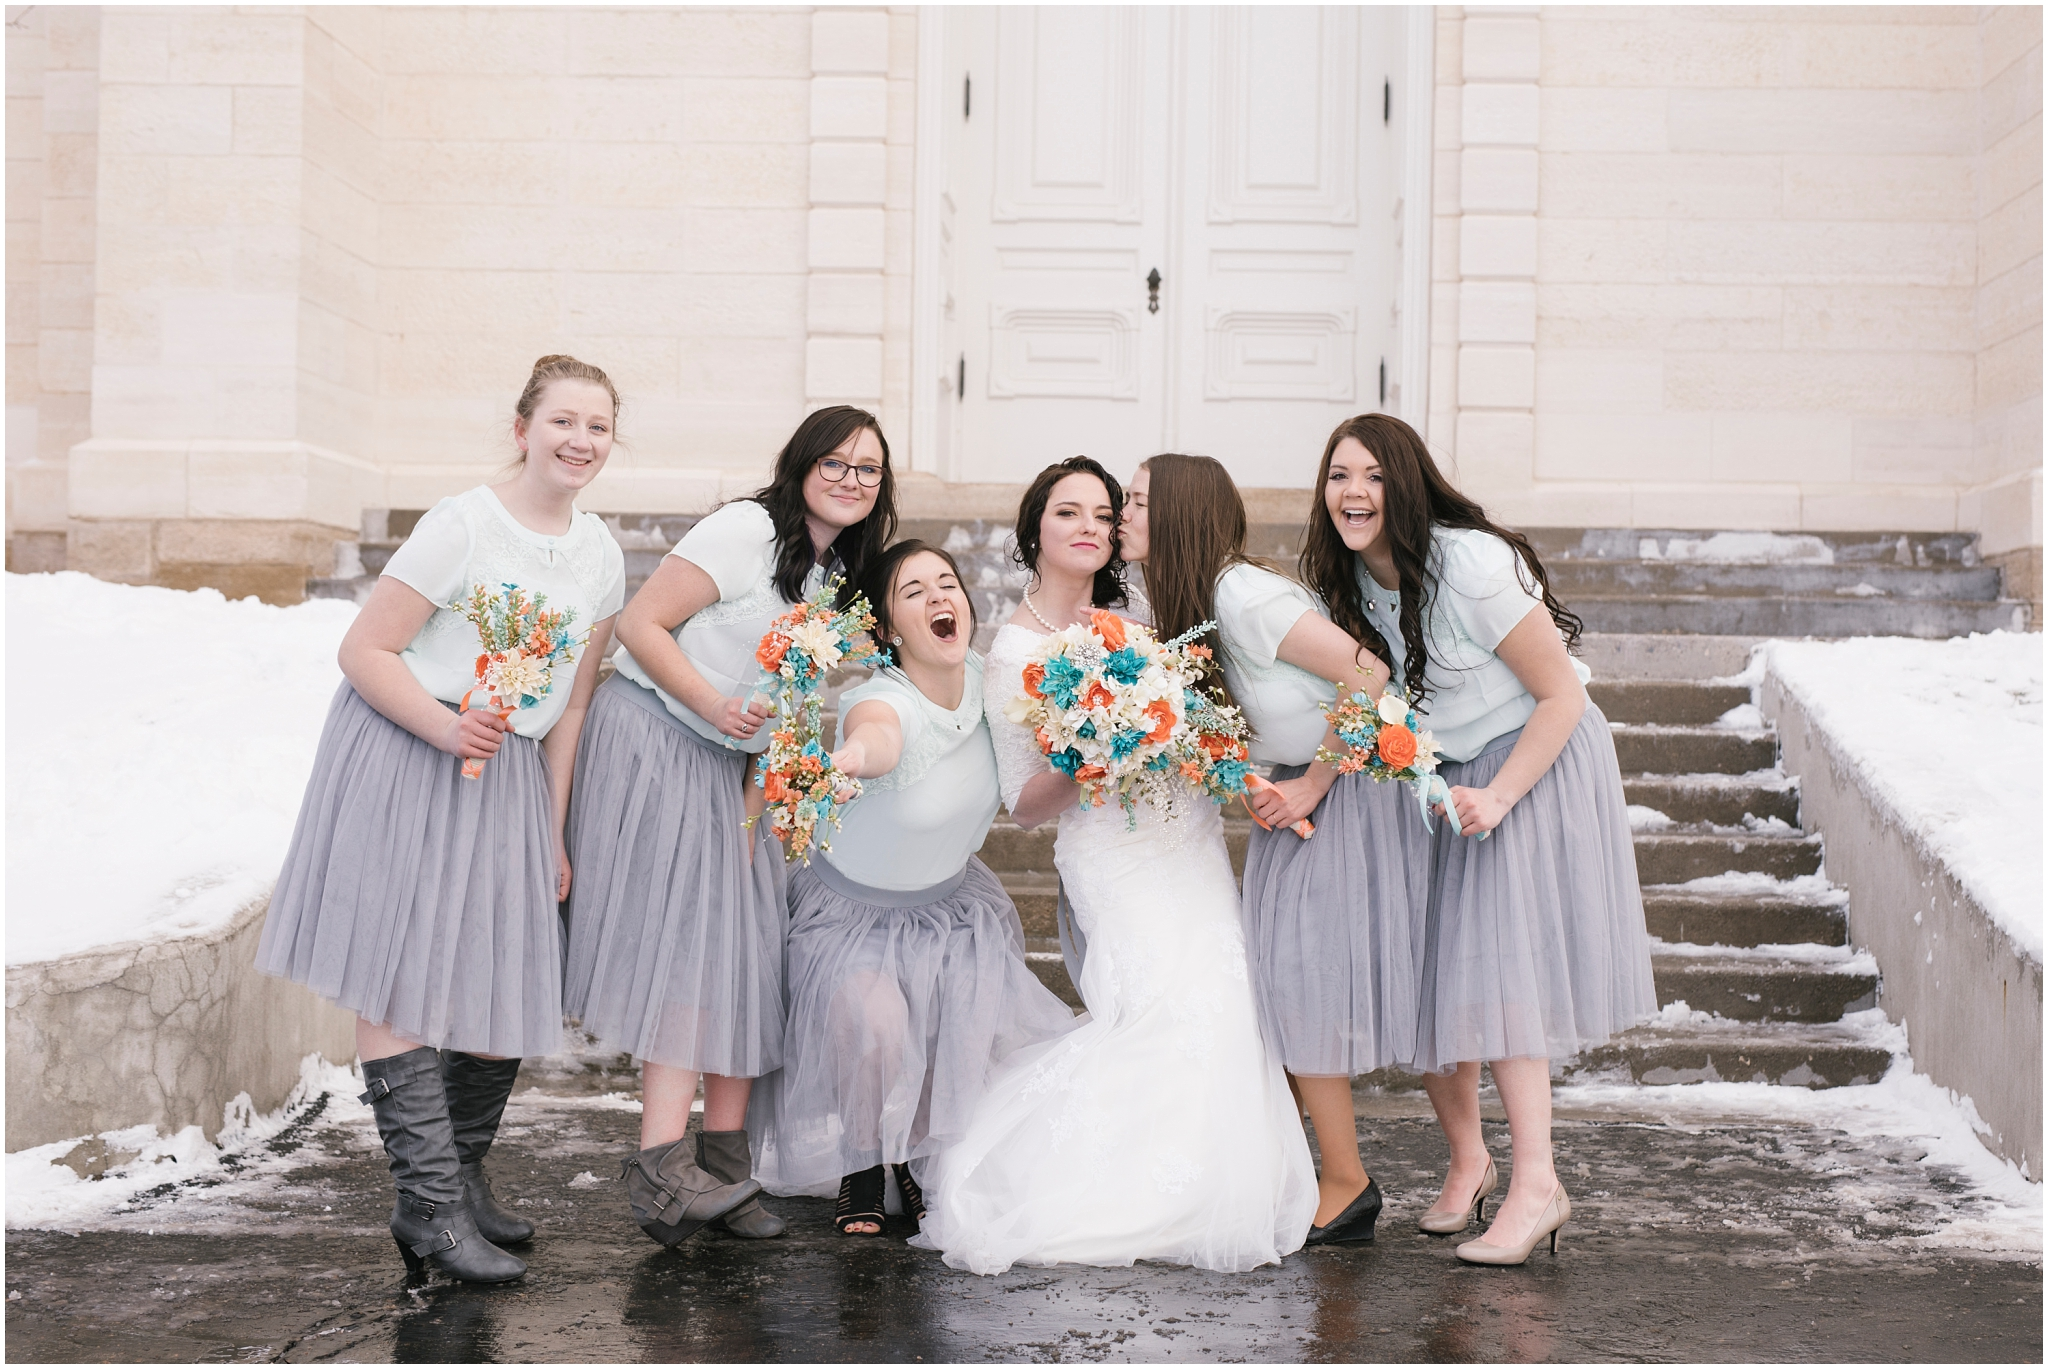 Bo Alyssa Wedding-89_Lizzie-B-Imagery-Utah-Wedding-Photographer-Central-Utah-Photographer-Utah-County-Manti-Temple.jpg